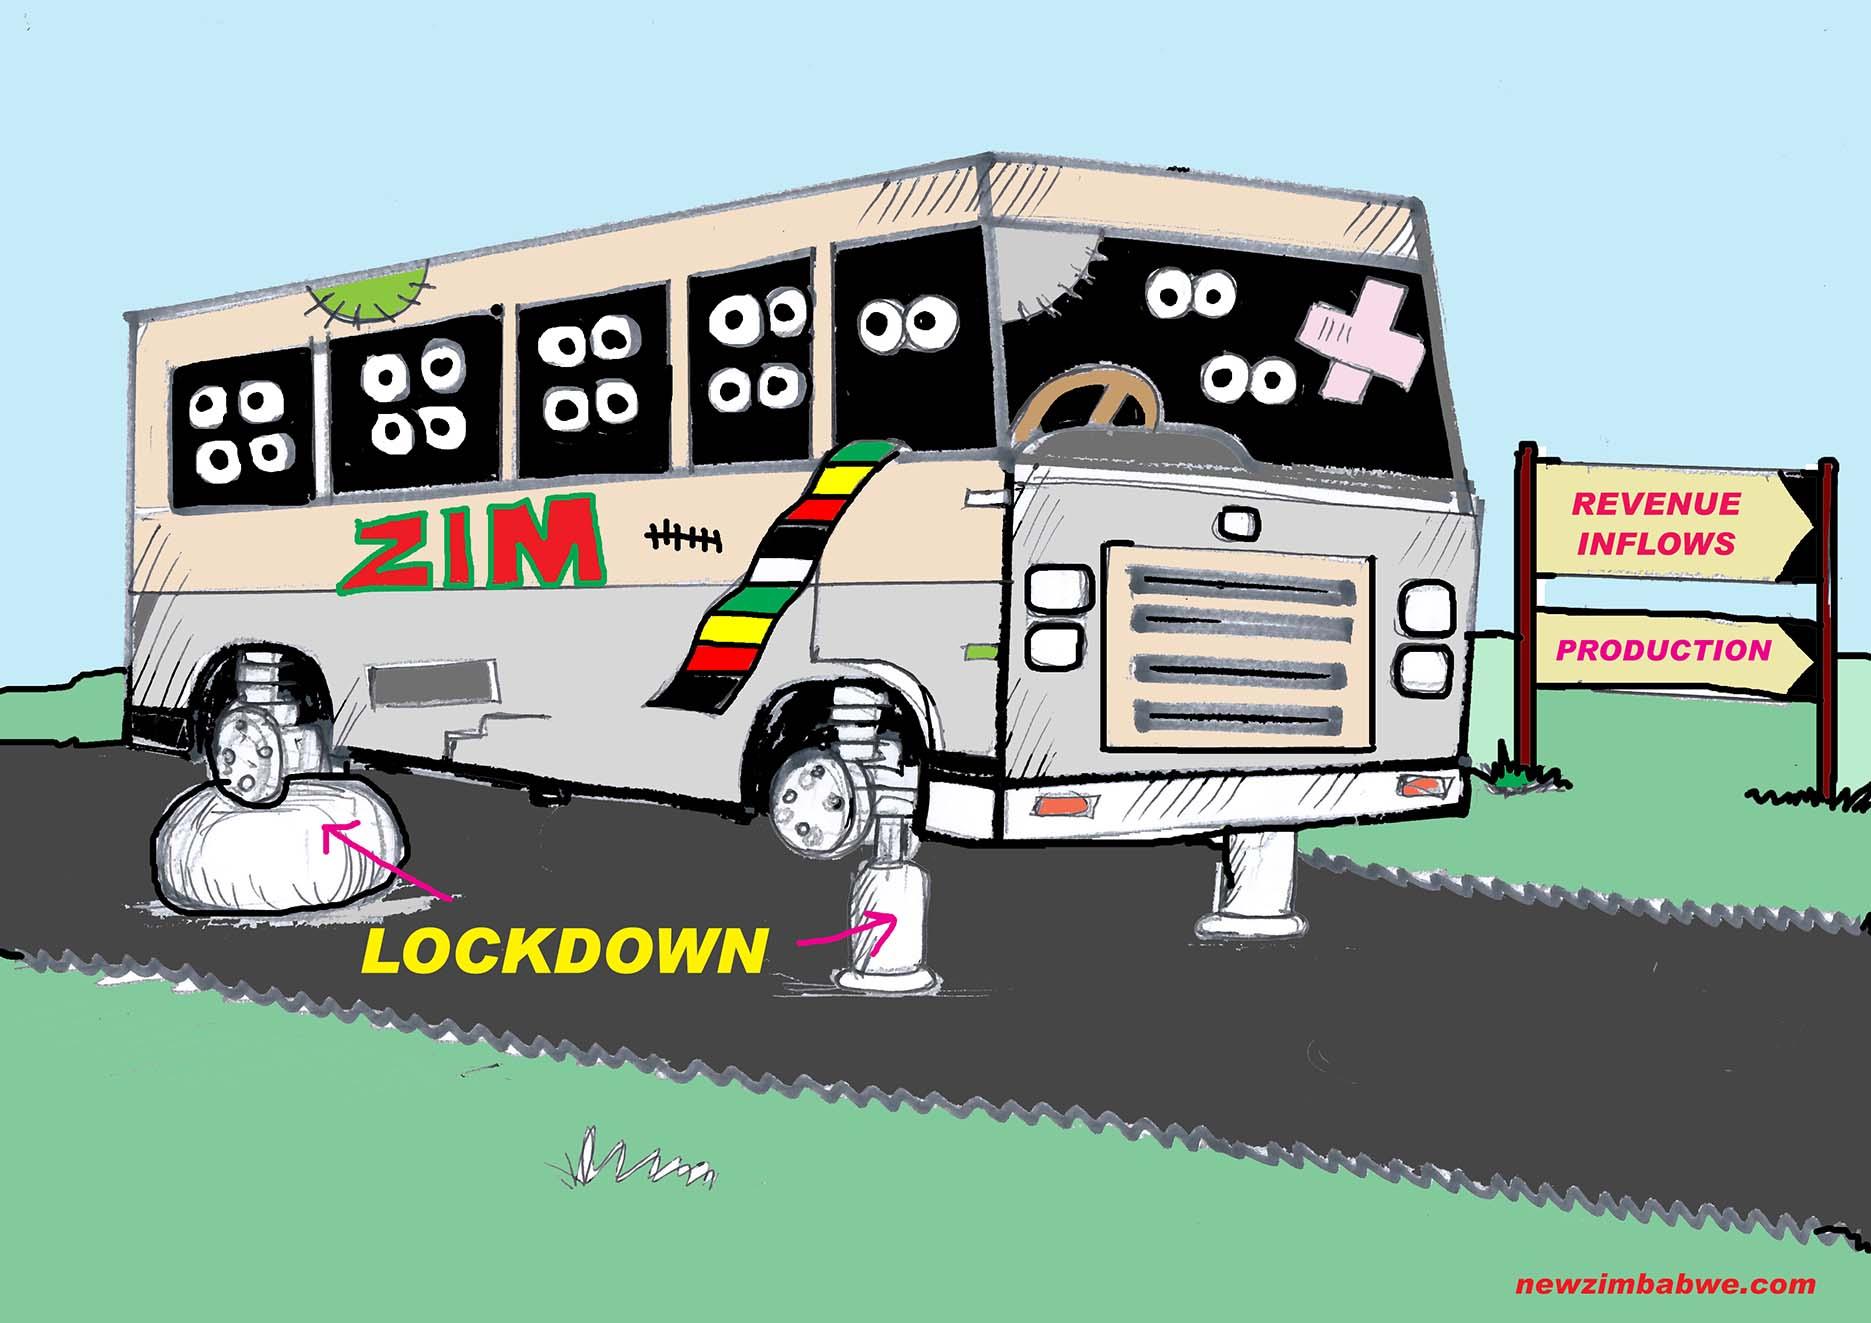 Industry wants lockdown lifted